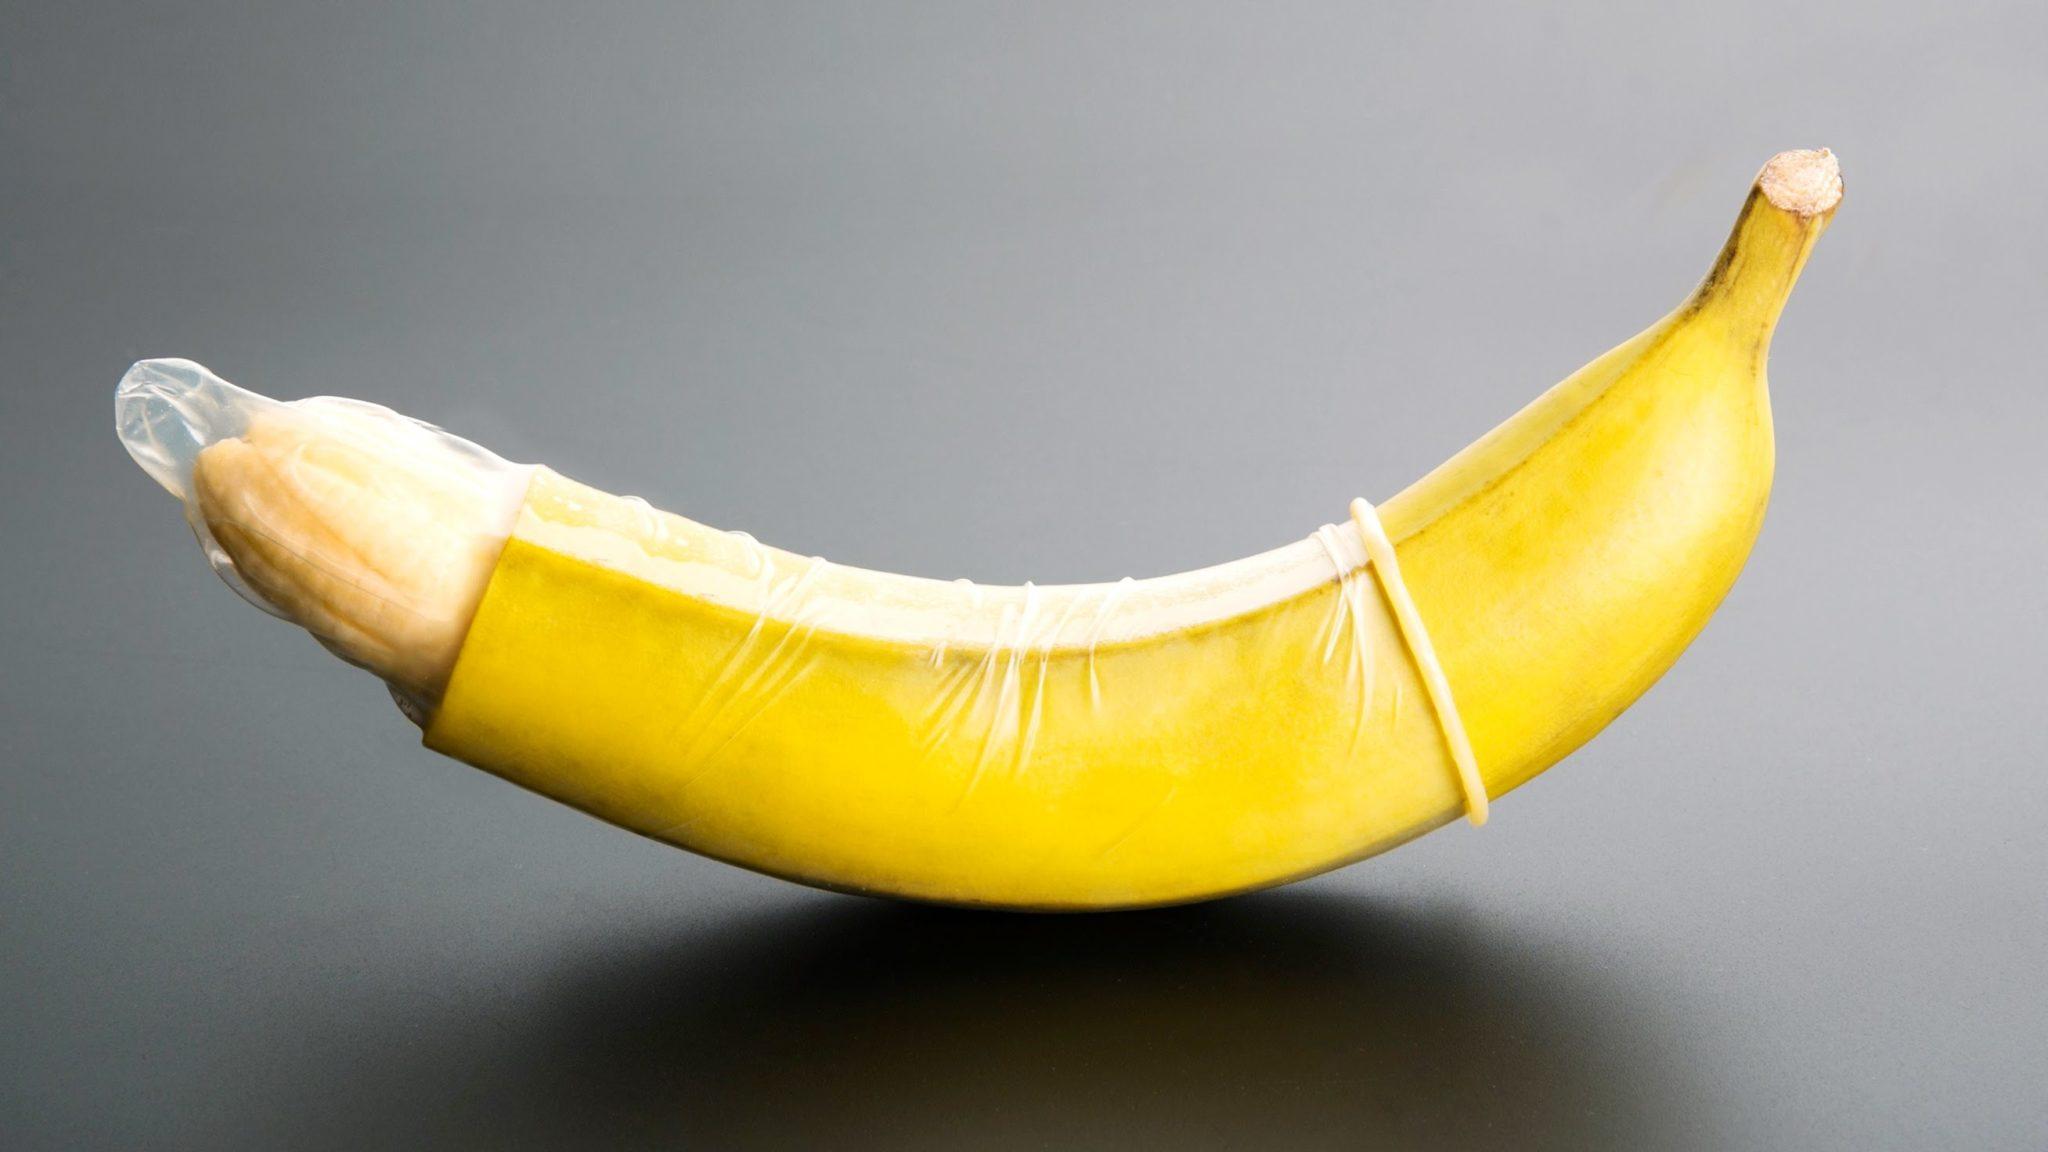 Член как банан фото 13 фотография